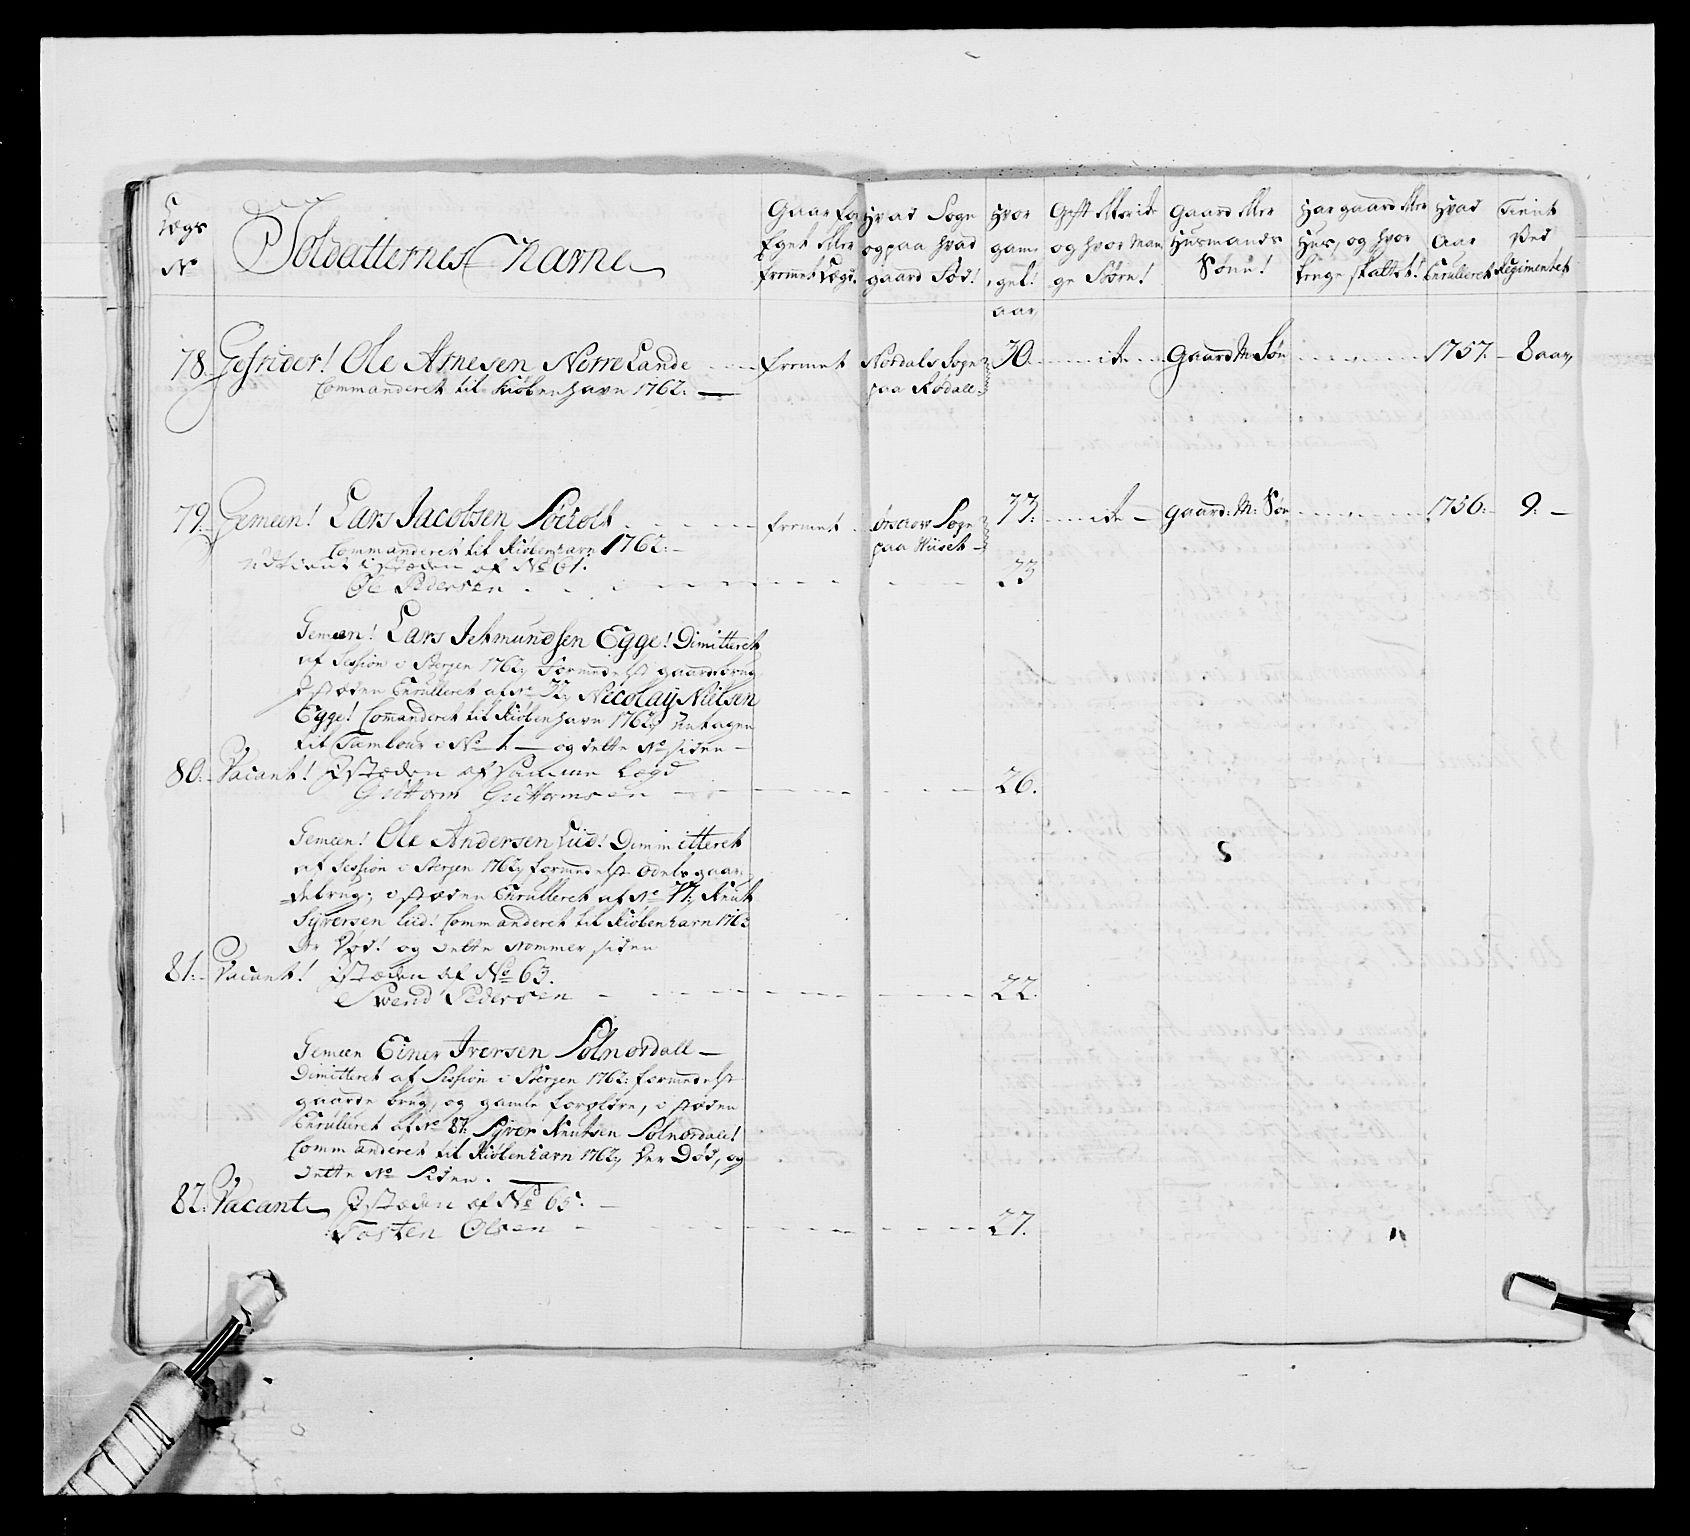 RA, Kommanderende general (KG I) med Det norske krigsdirektorium, E/Ea/L0518: 1. Bergenhusiske regiment, 1760-1765, s. 551